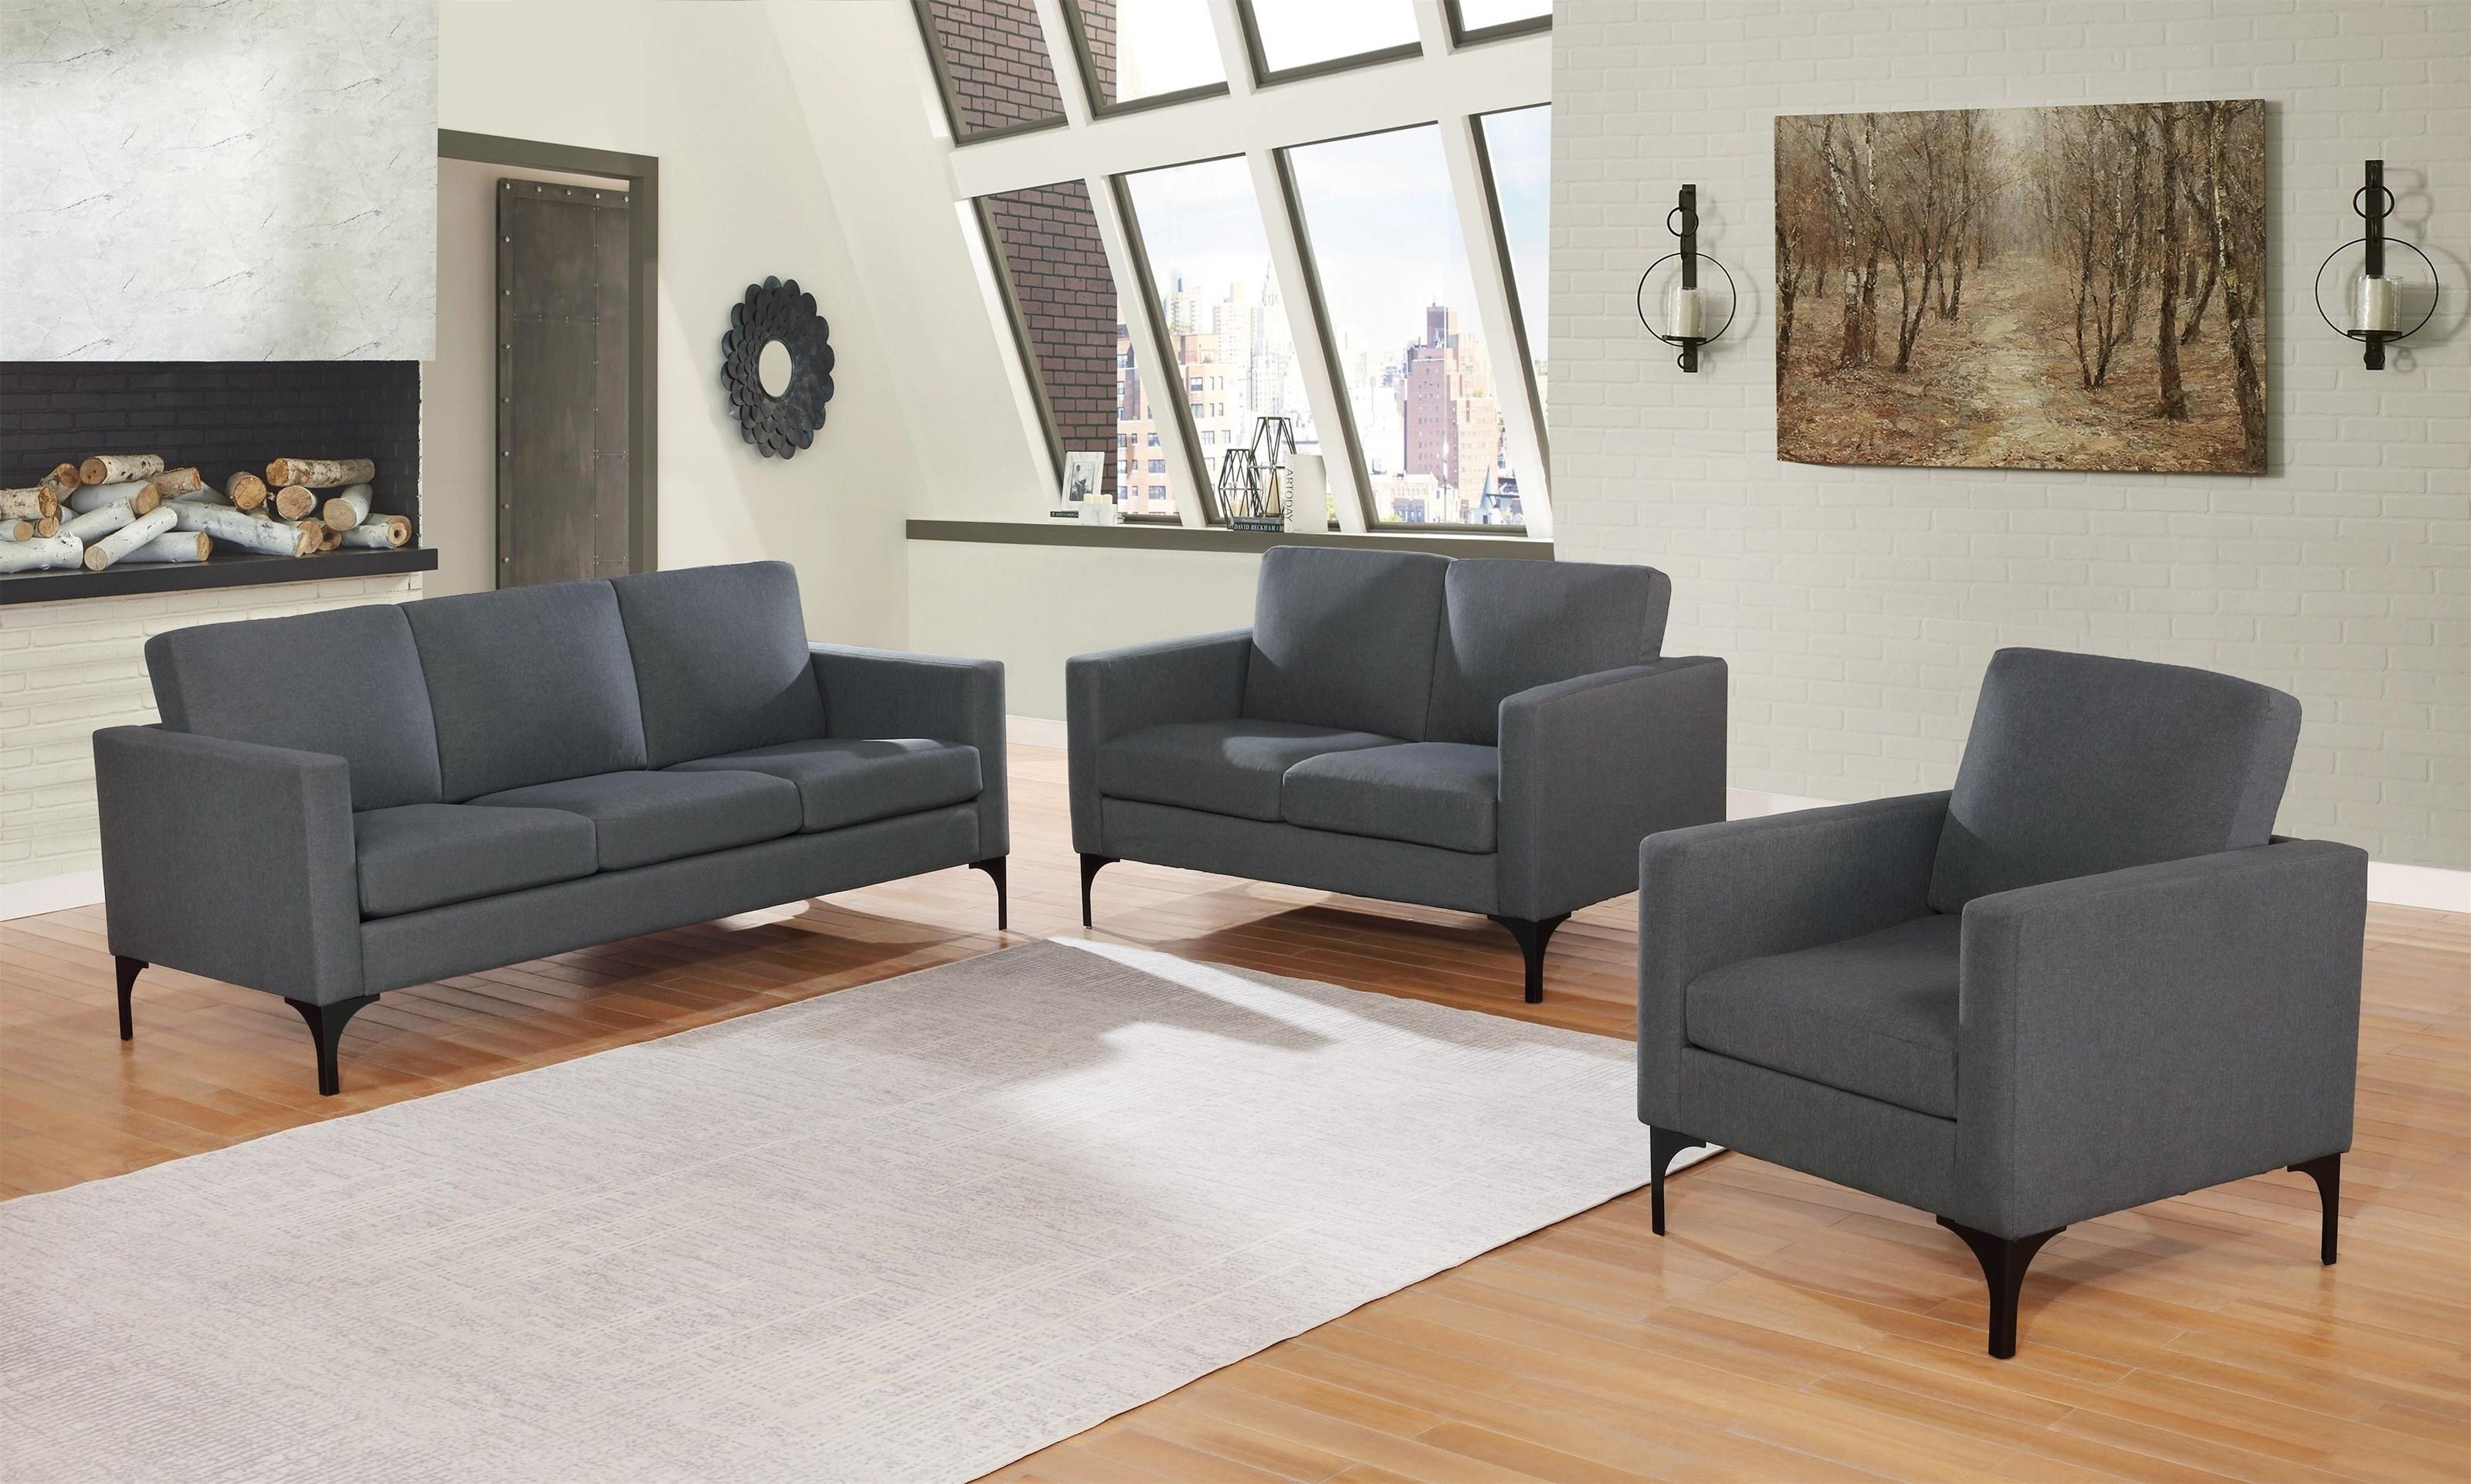 3 Piece Sofa/Loveseat/Chair